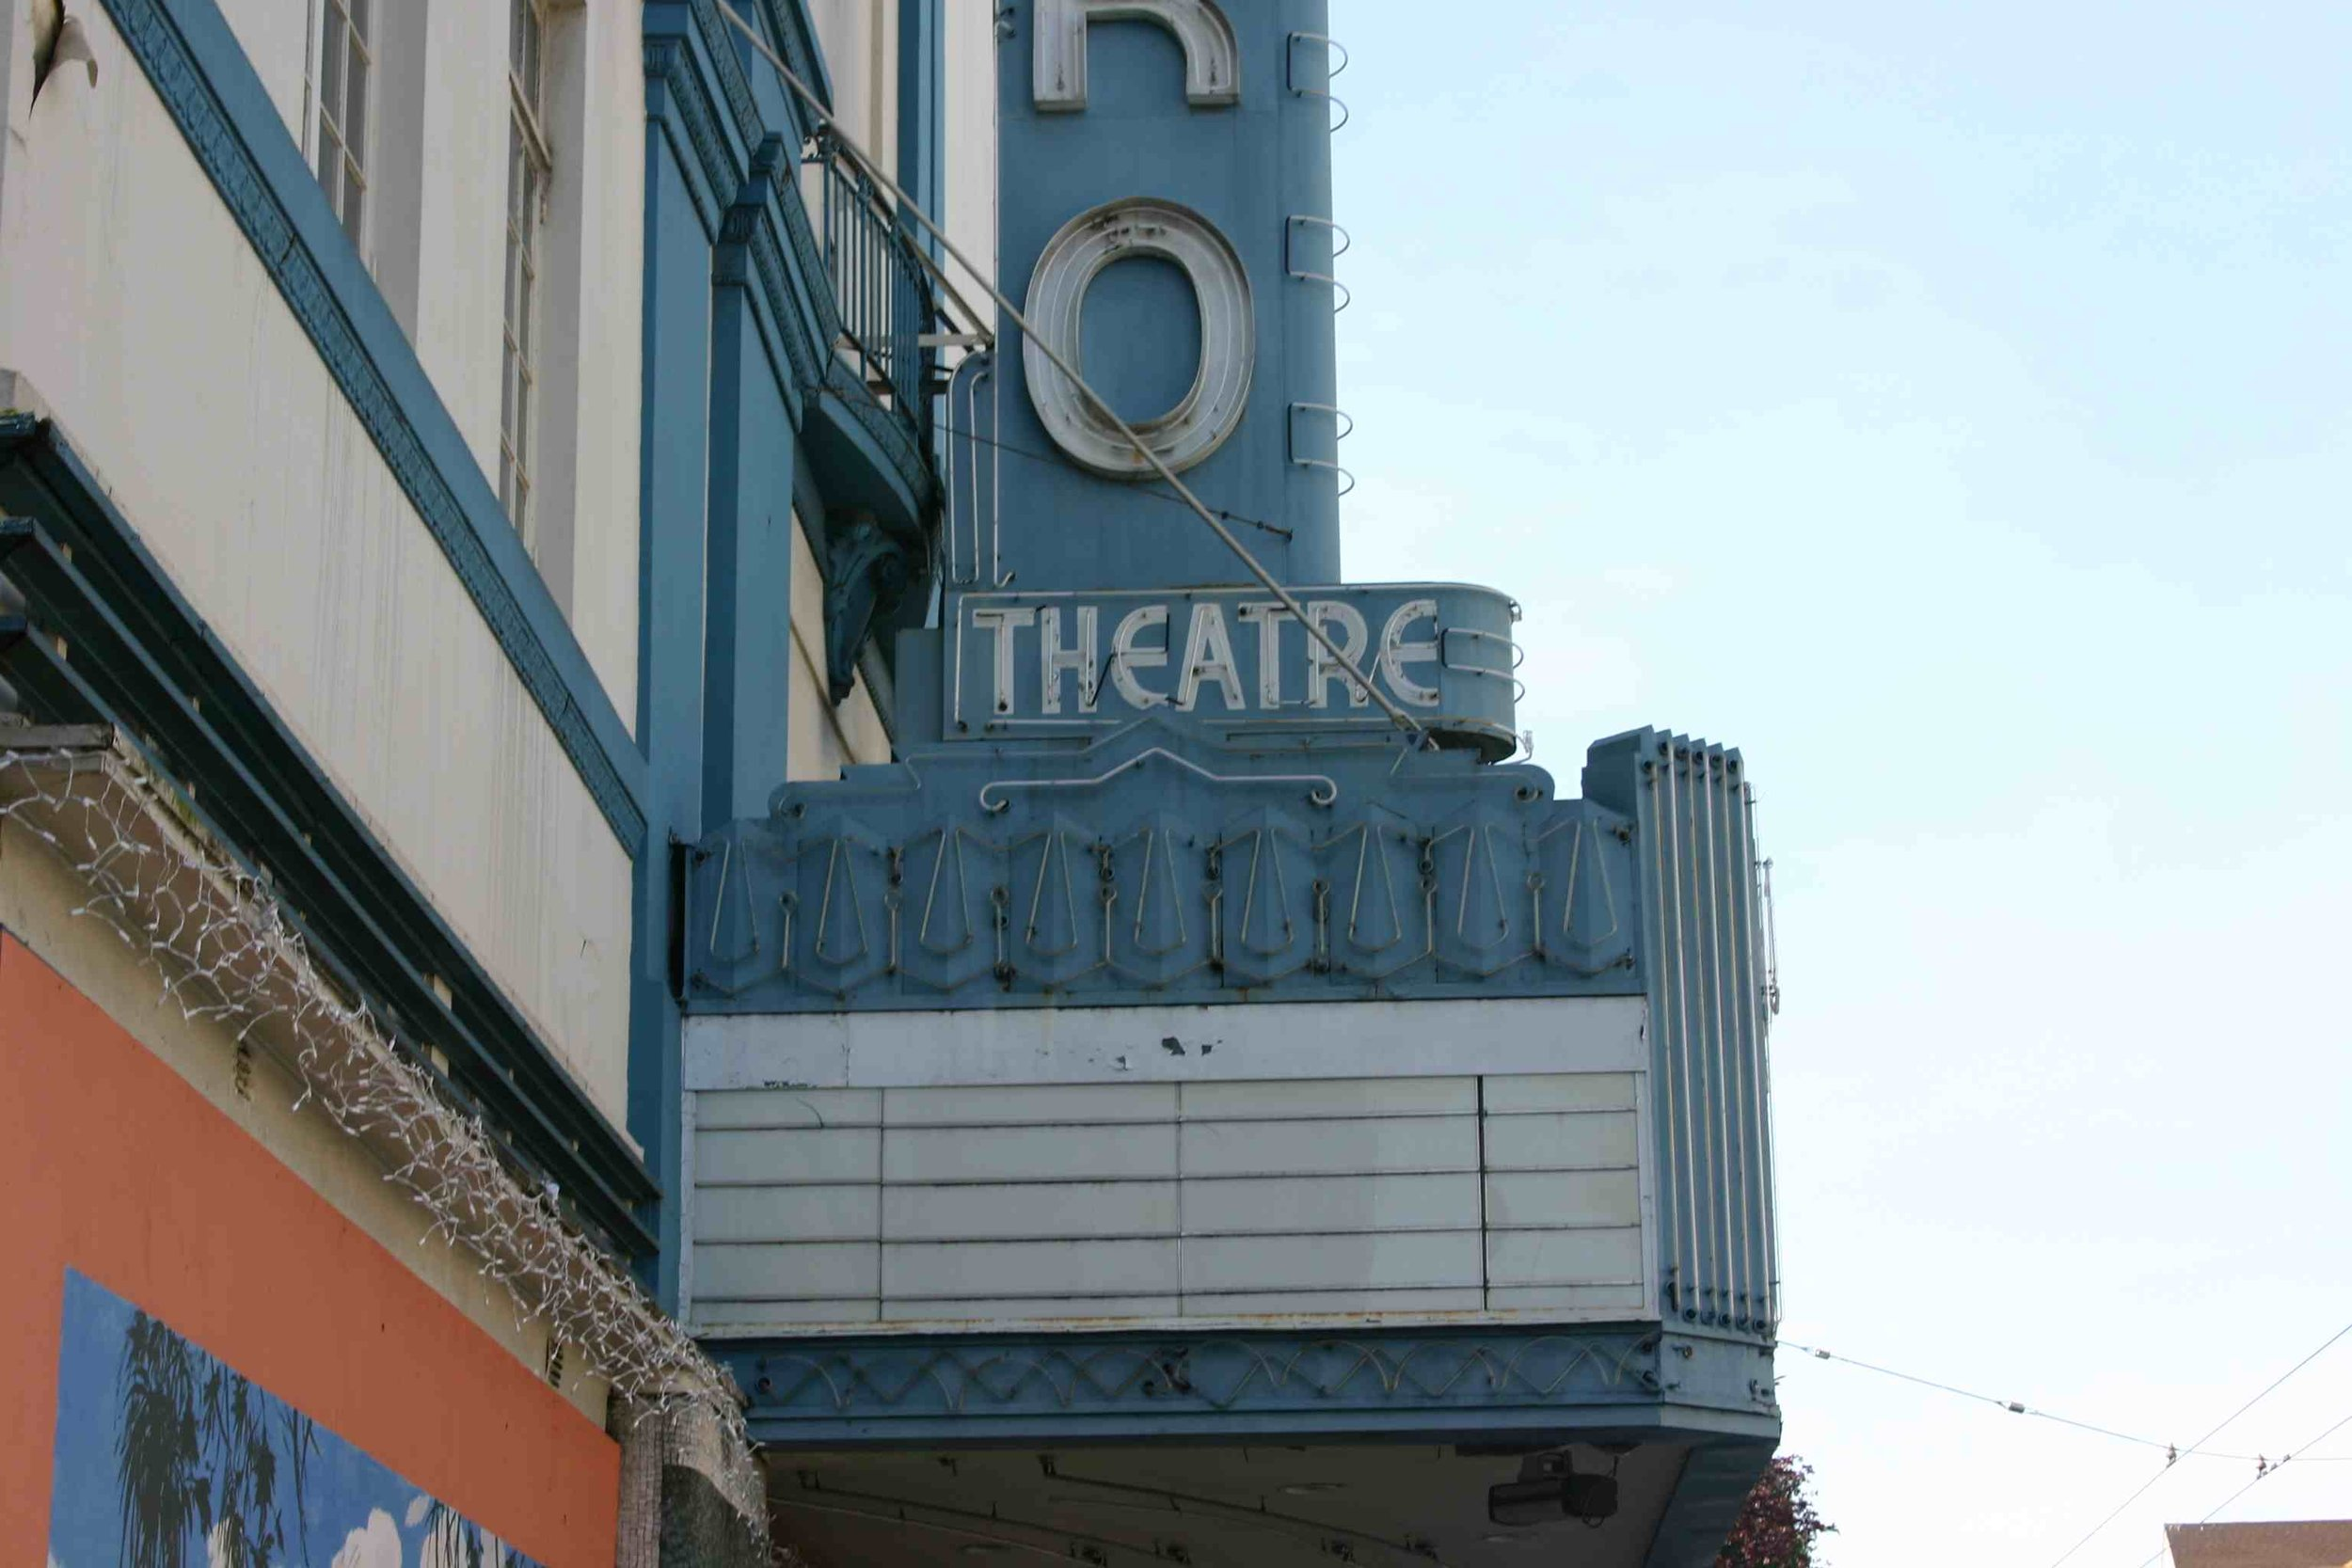 Metro Theater, Union St., San Francisco, February 2012